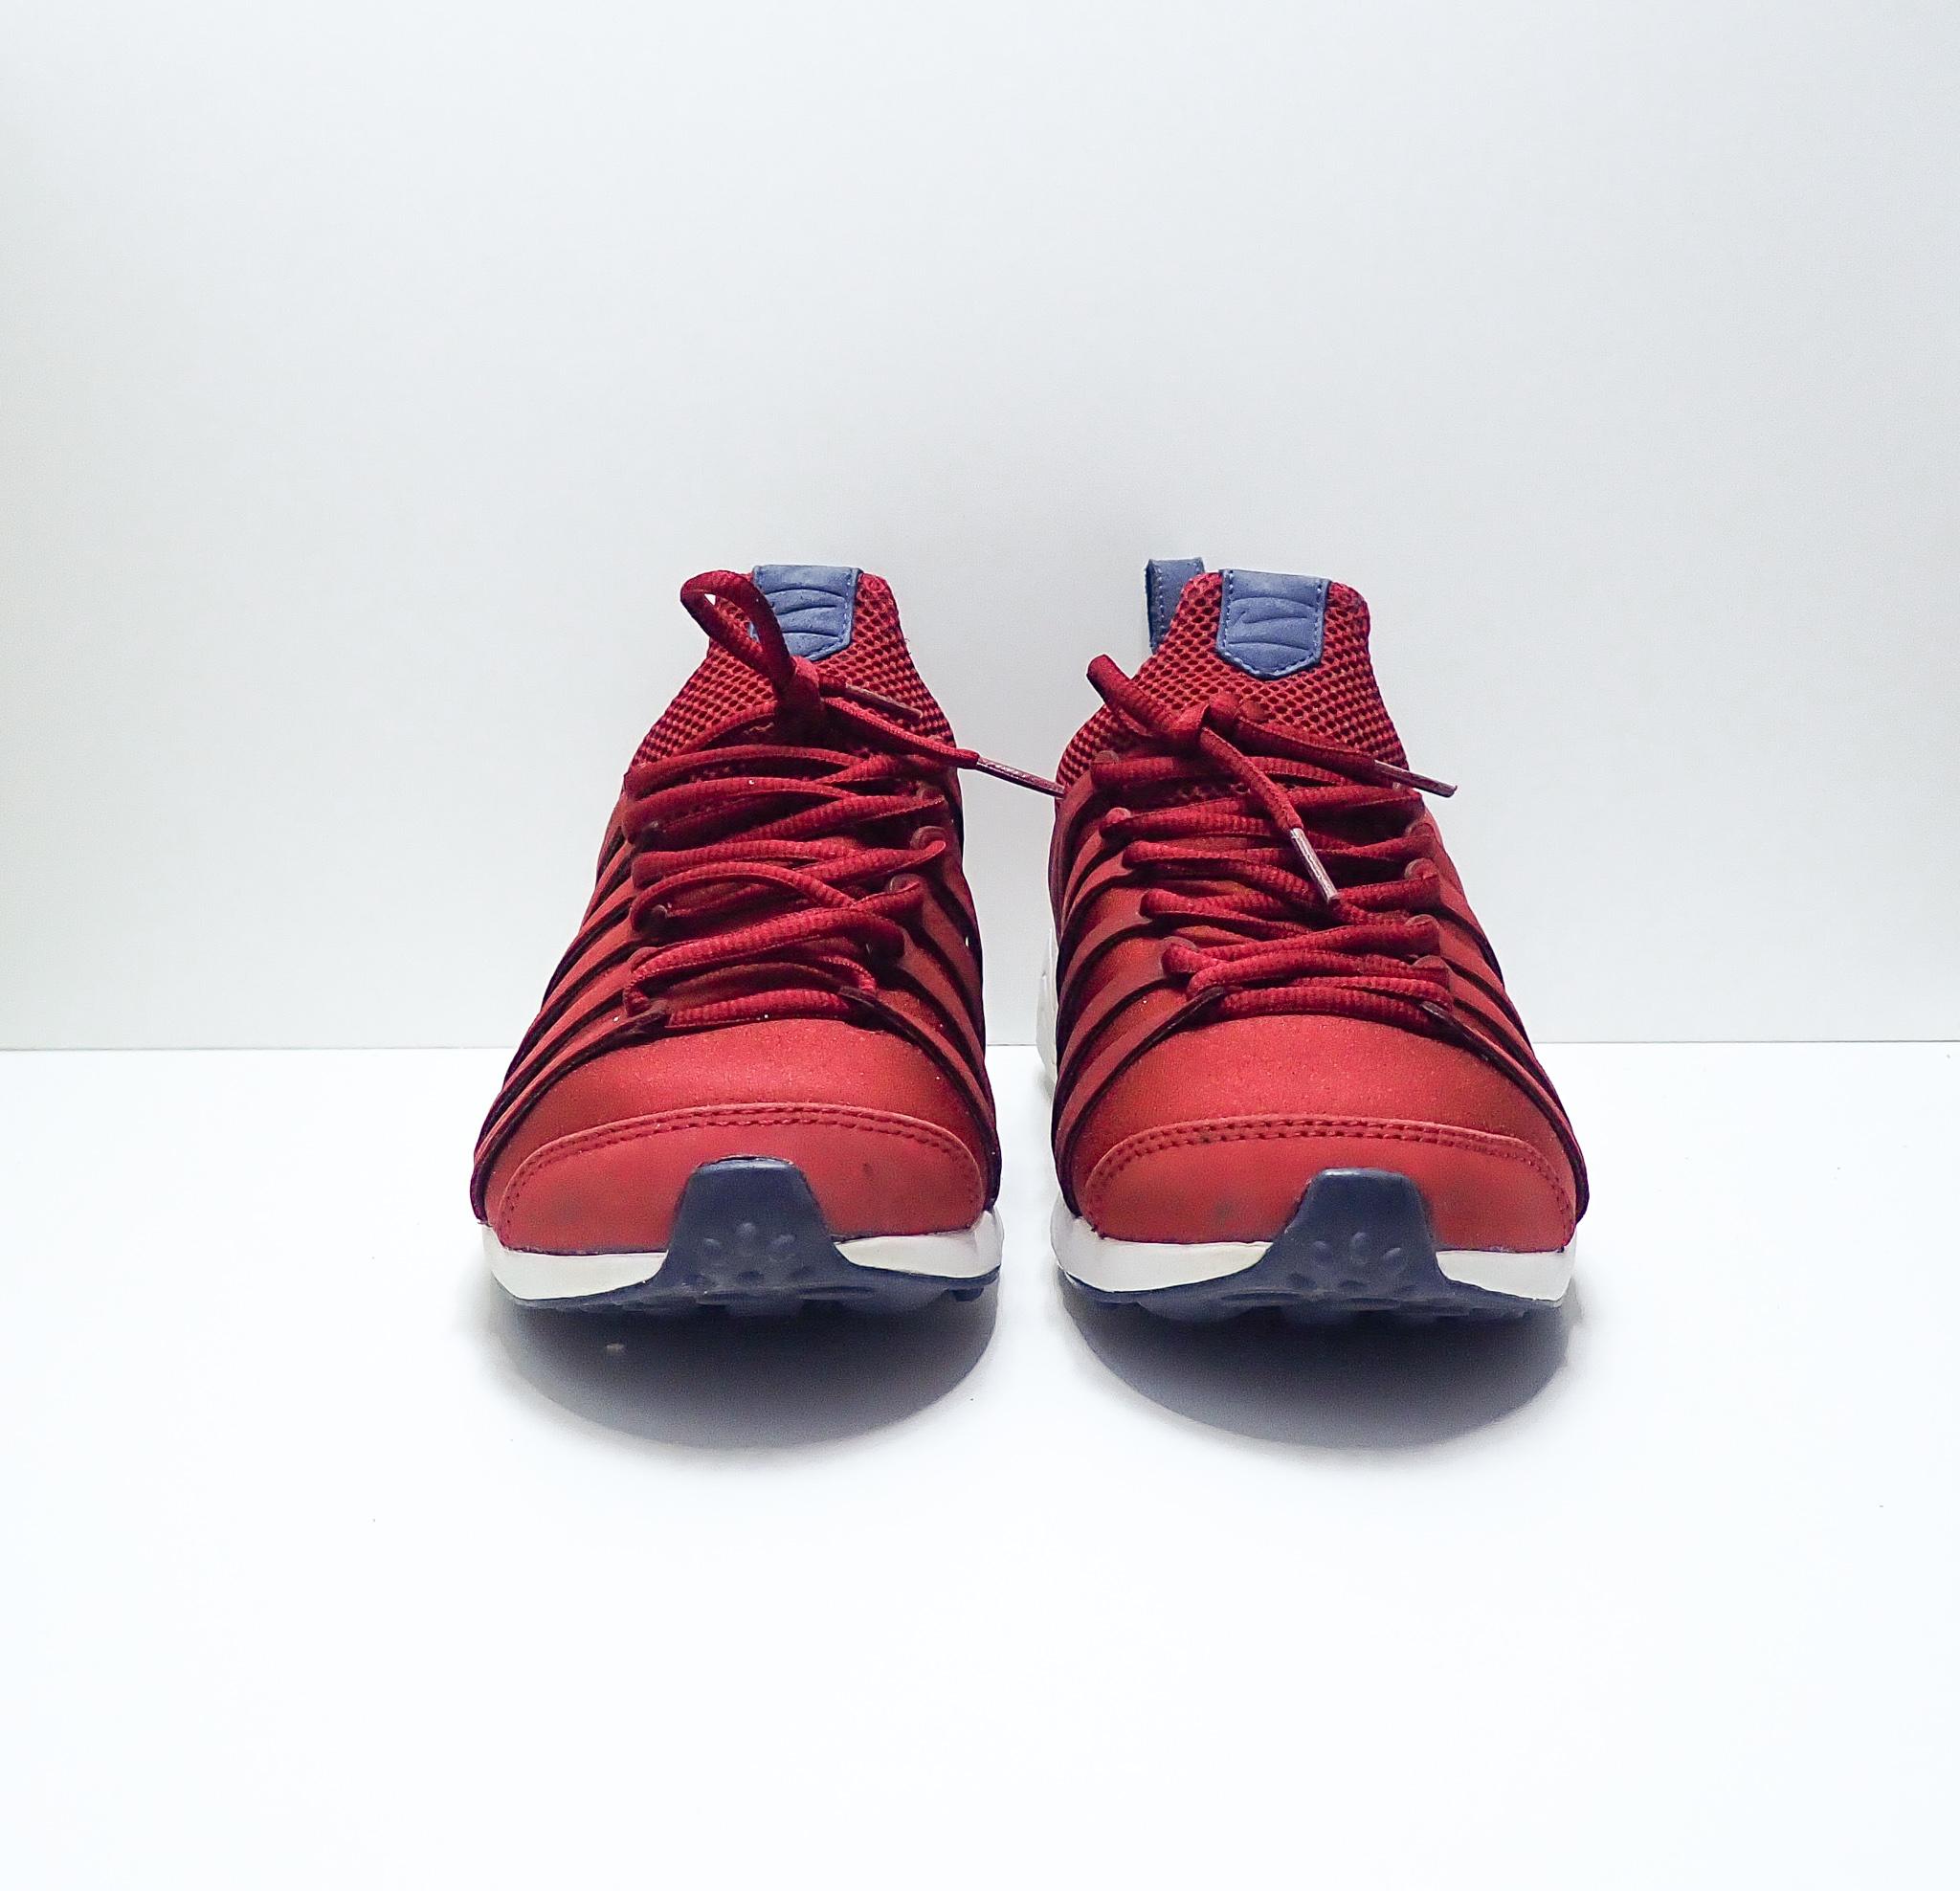 Nike Air Zoom Spirimic